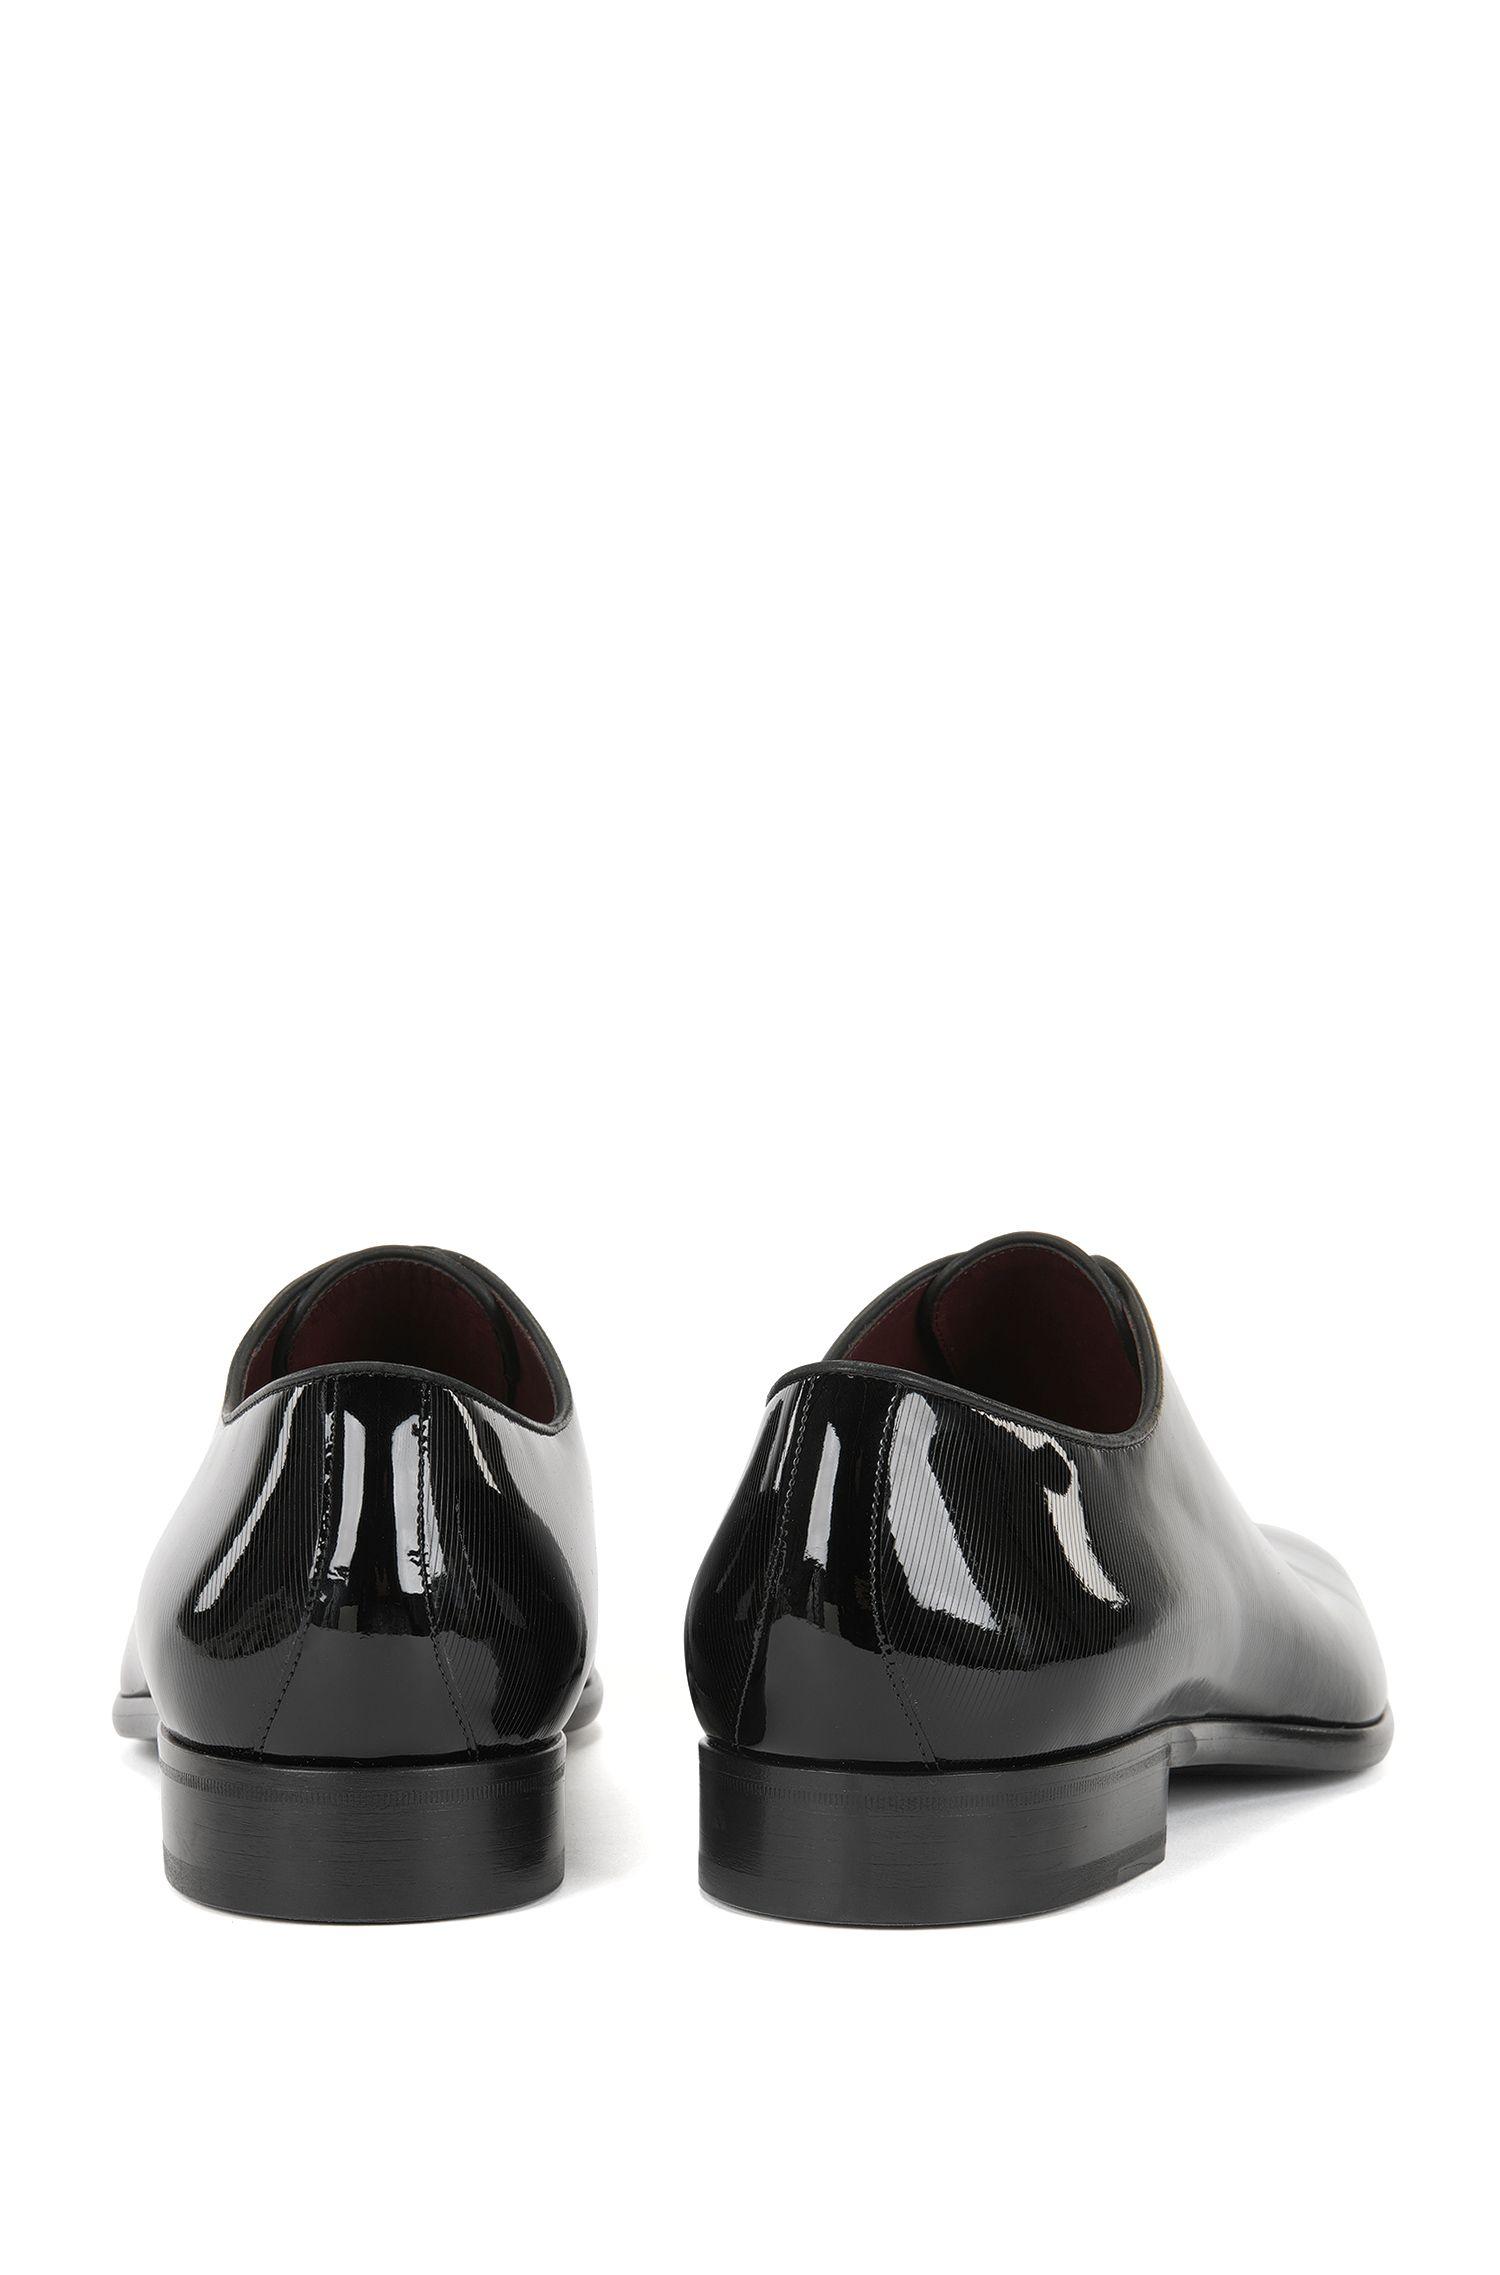 Patent Leather Oxford Shoe | T-Club Oxfr Pals, Black